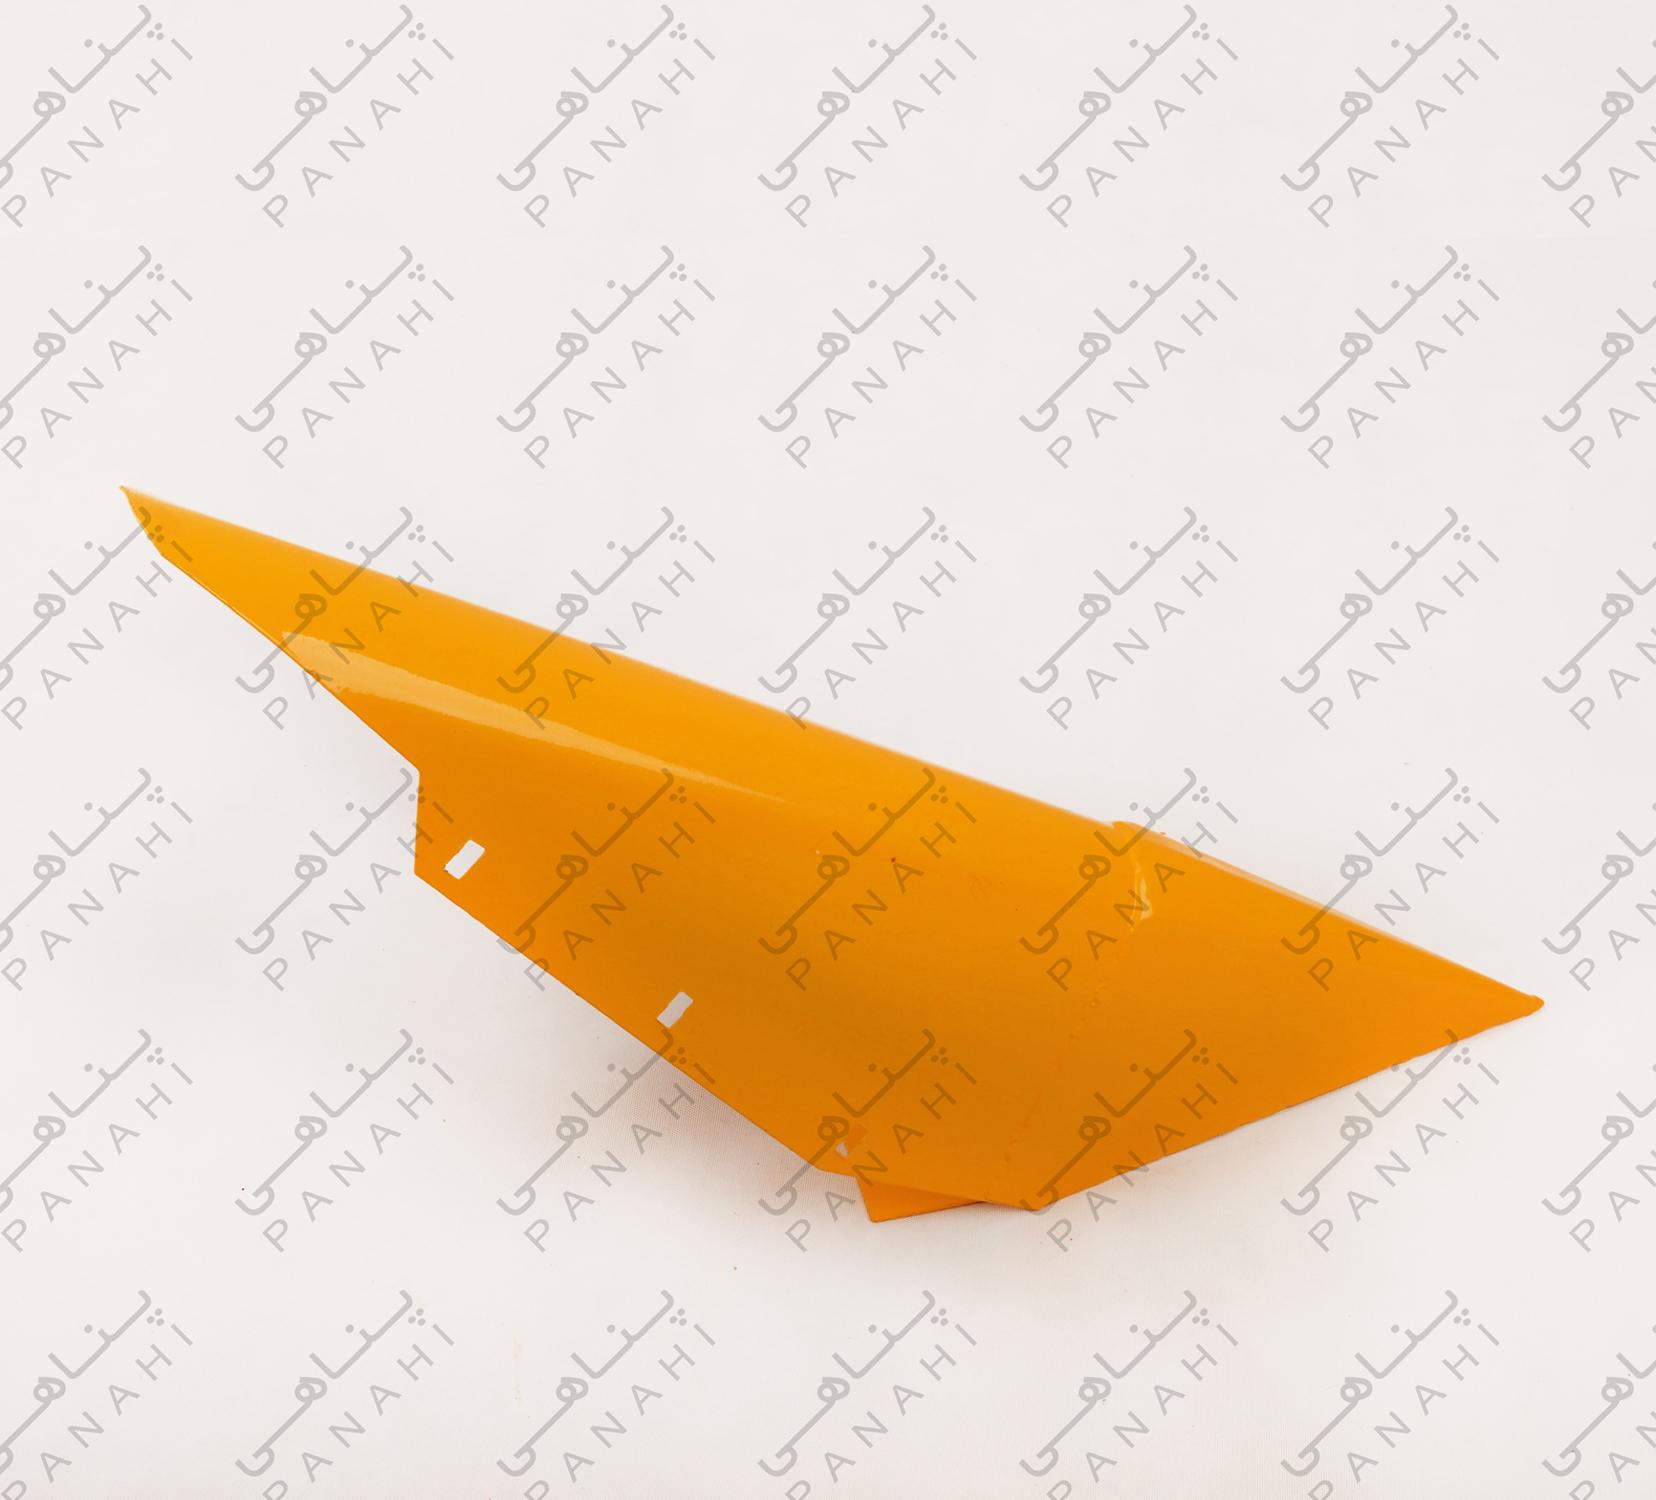 3318.CNH-P موشکی راهنما چپ